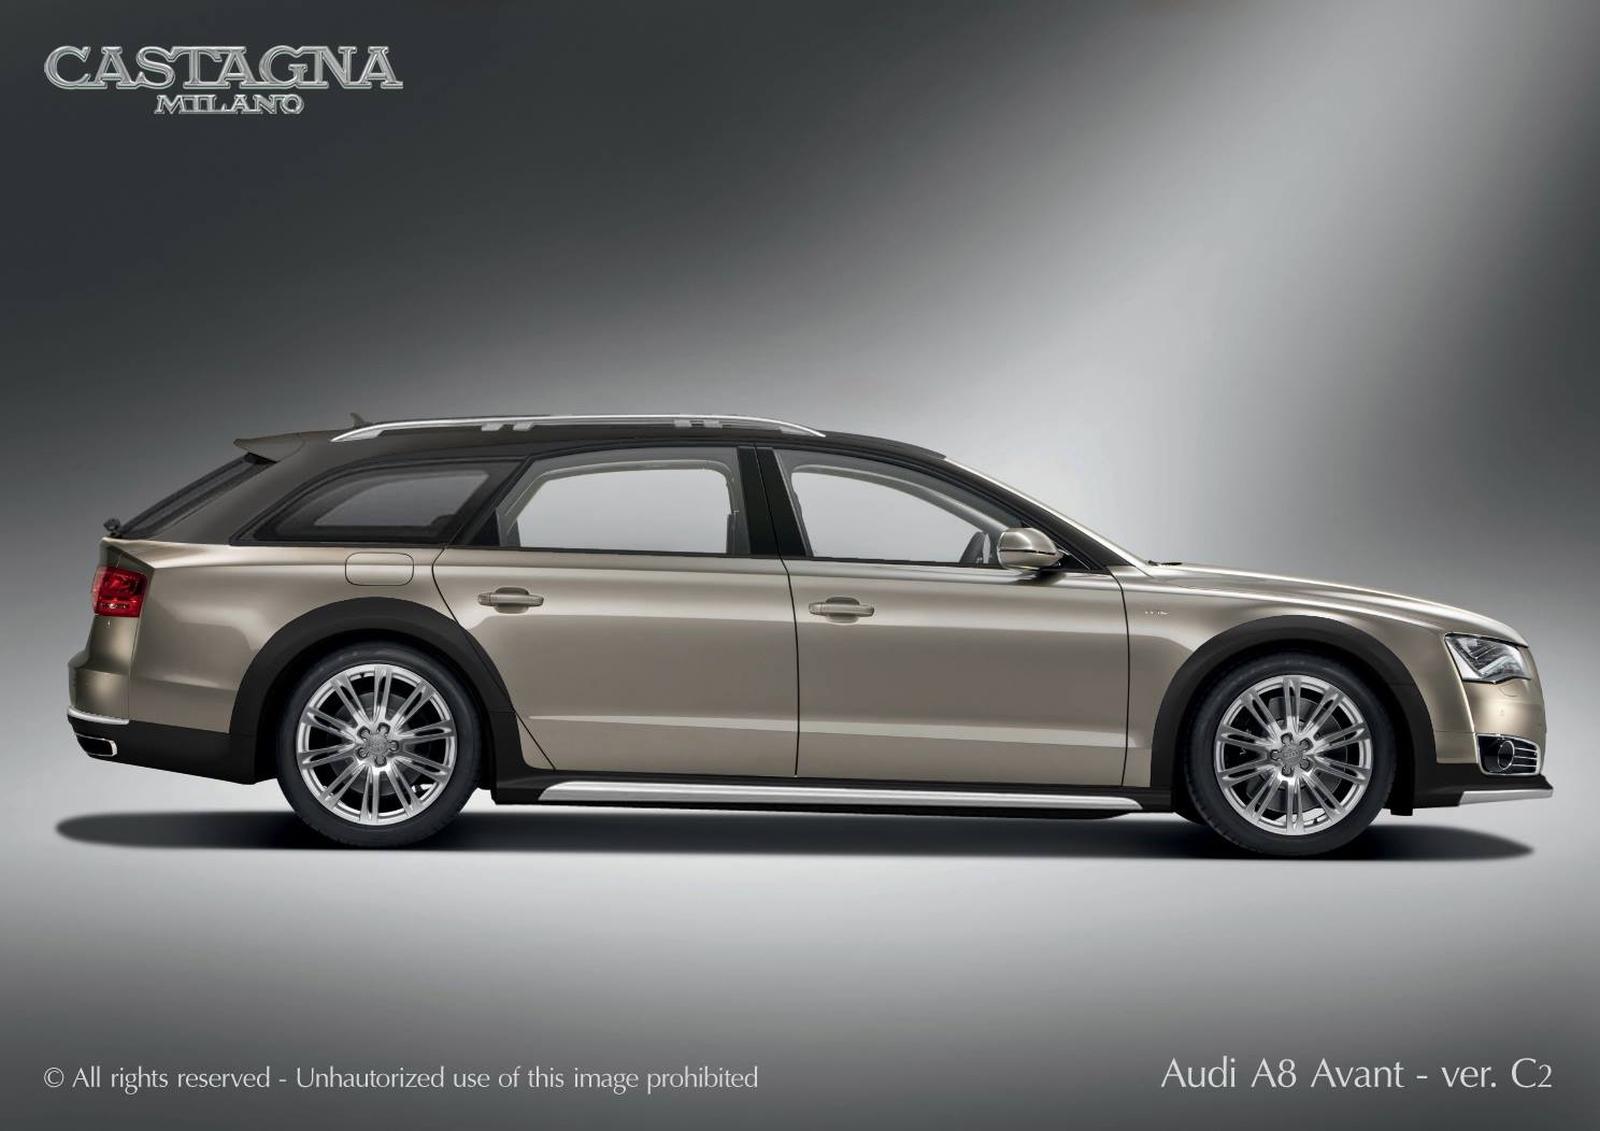 Castagna Milano - Audi A8 Avant